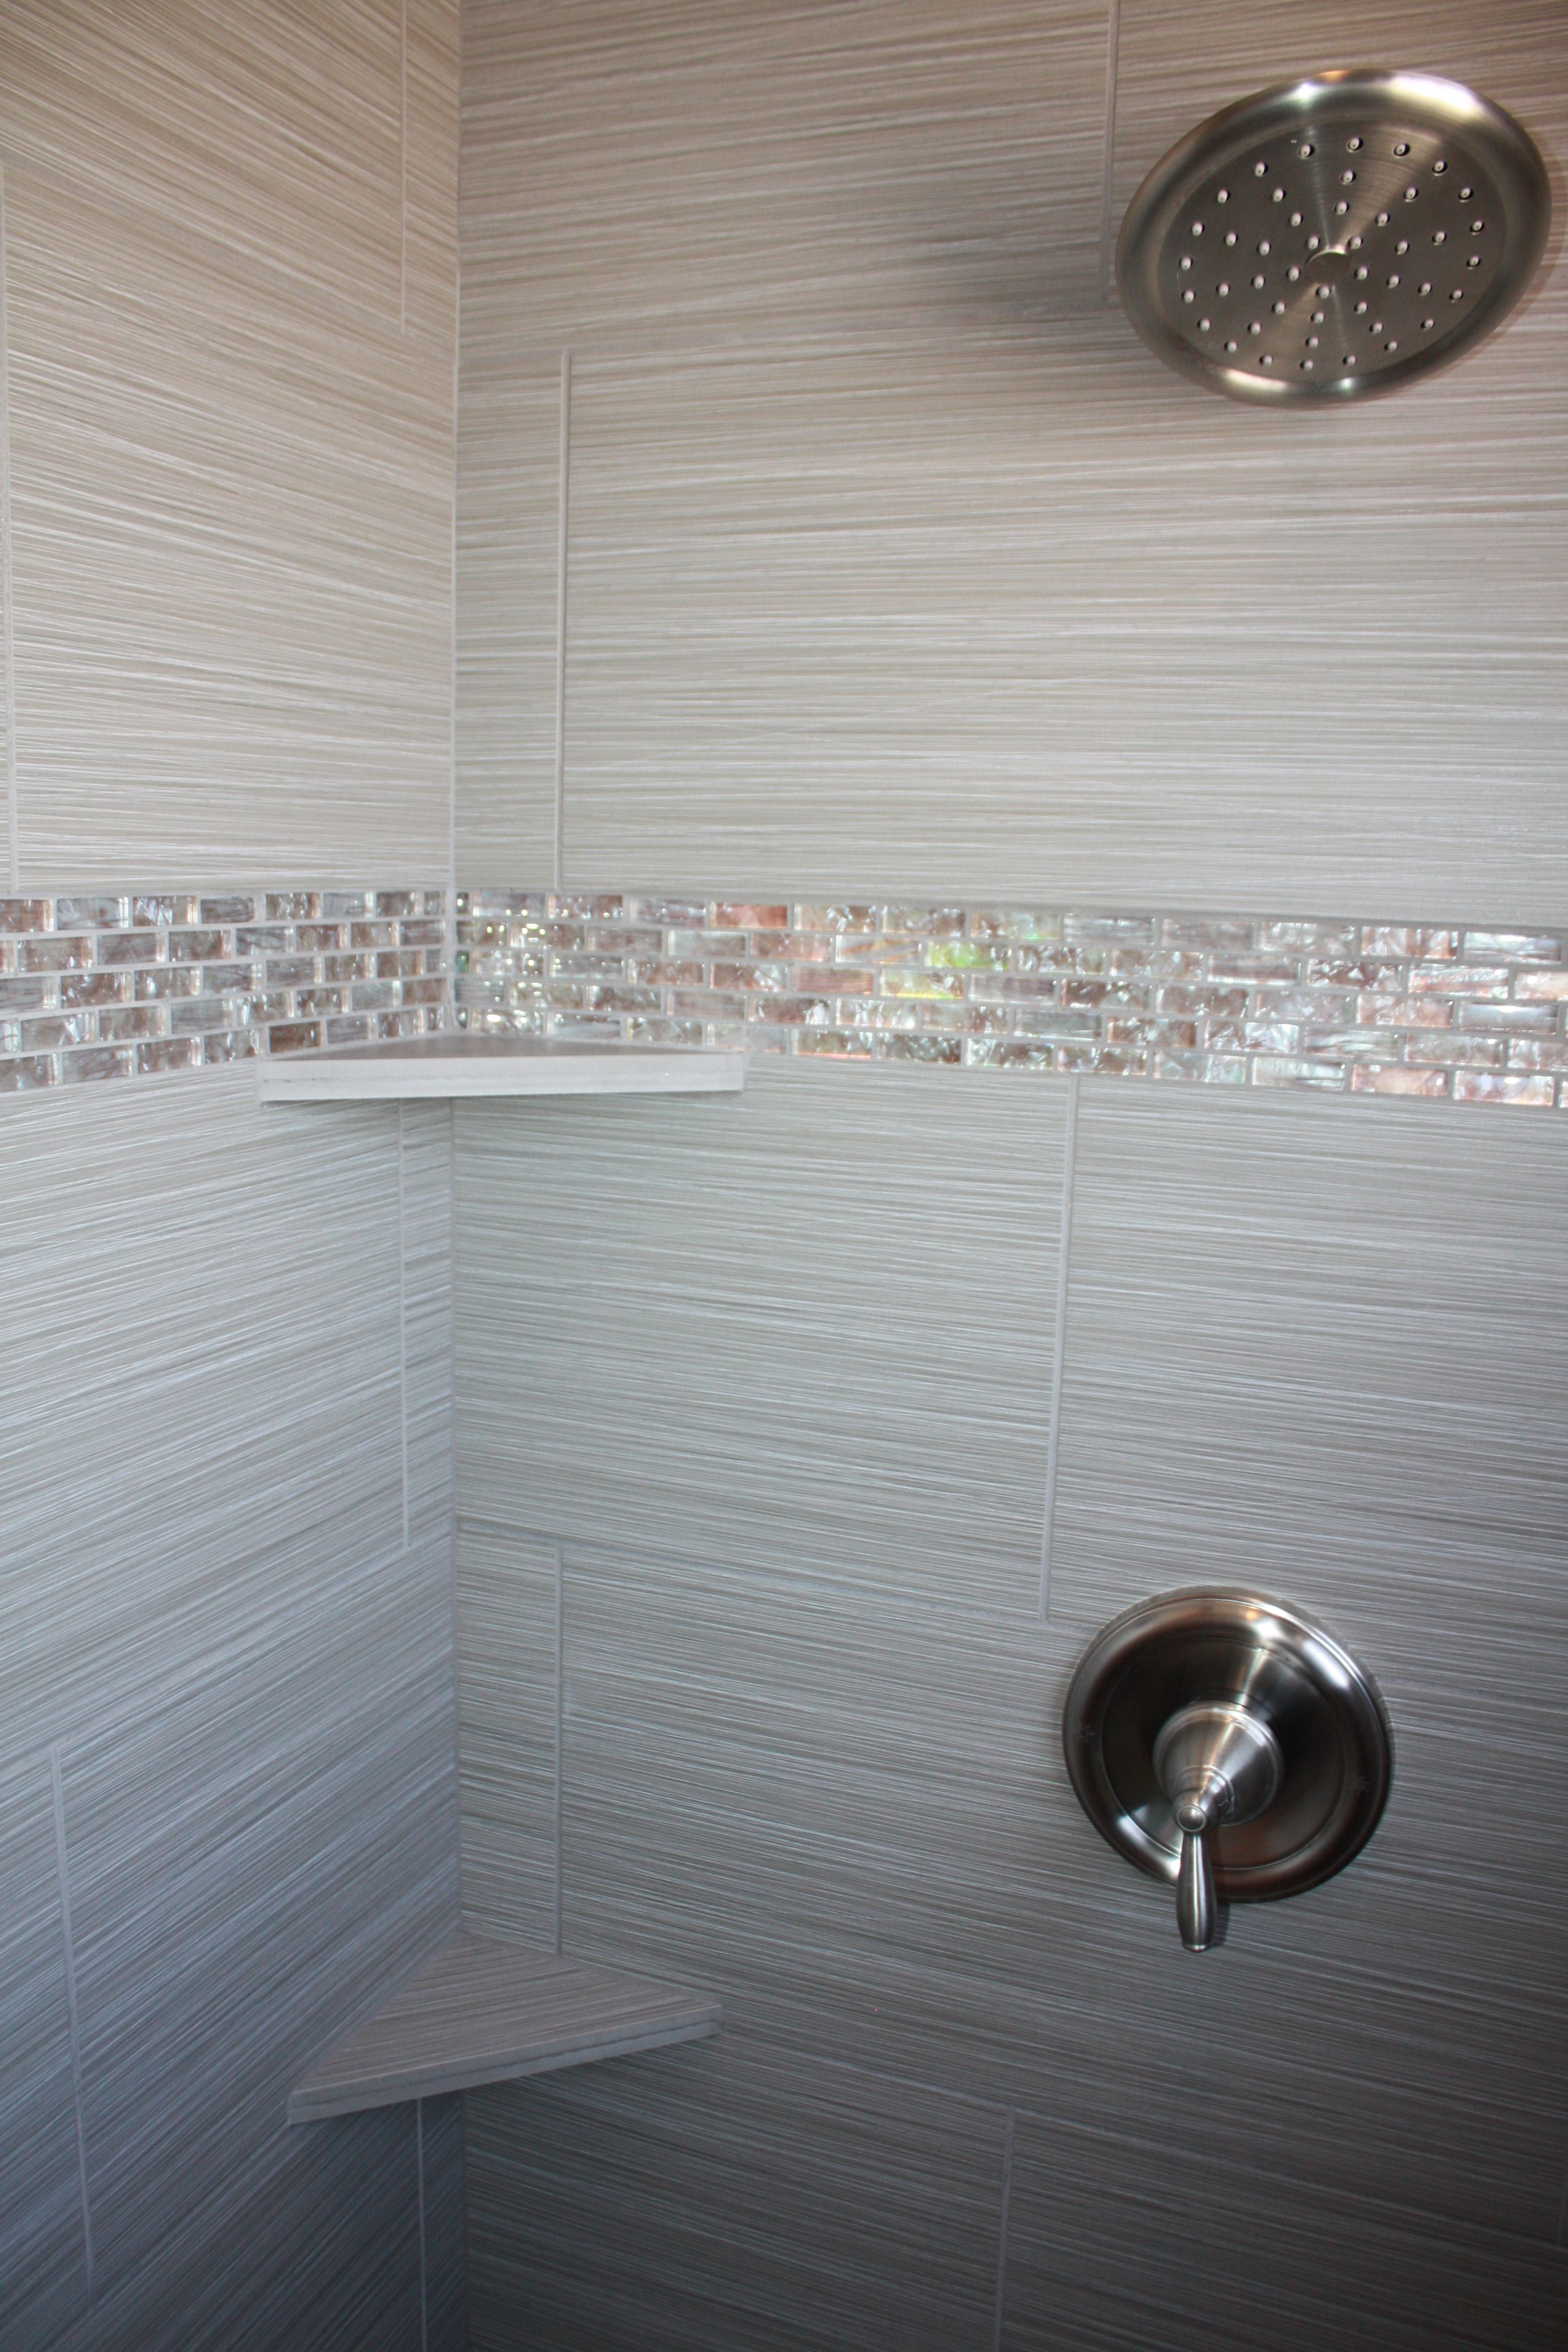 Glass Shower Designs And Shower Tile Design Sh Home Design Houzz With Images Bathroom Tile Inspiration Tile Bathroom Bathroom Tile Designs